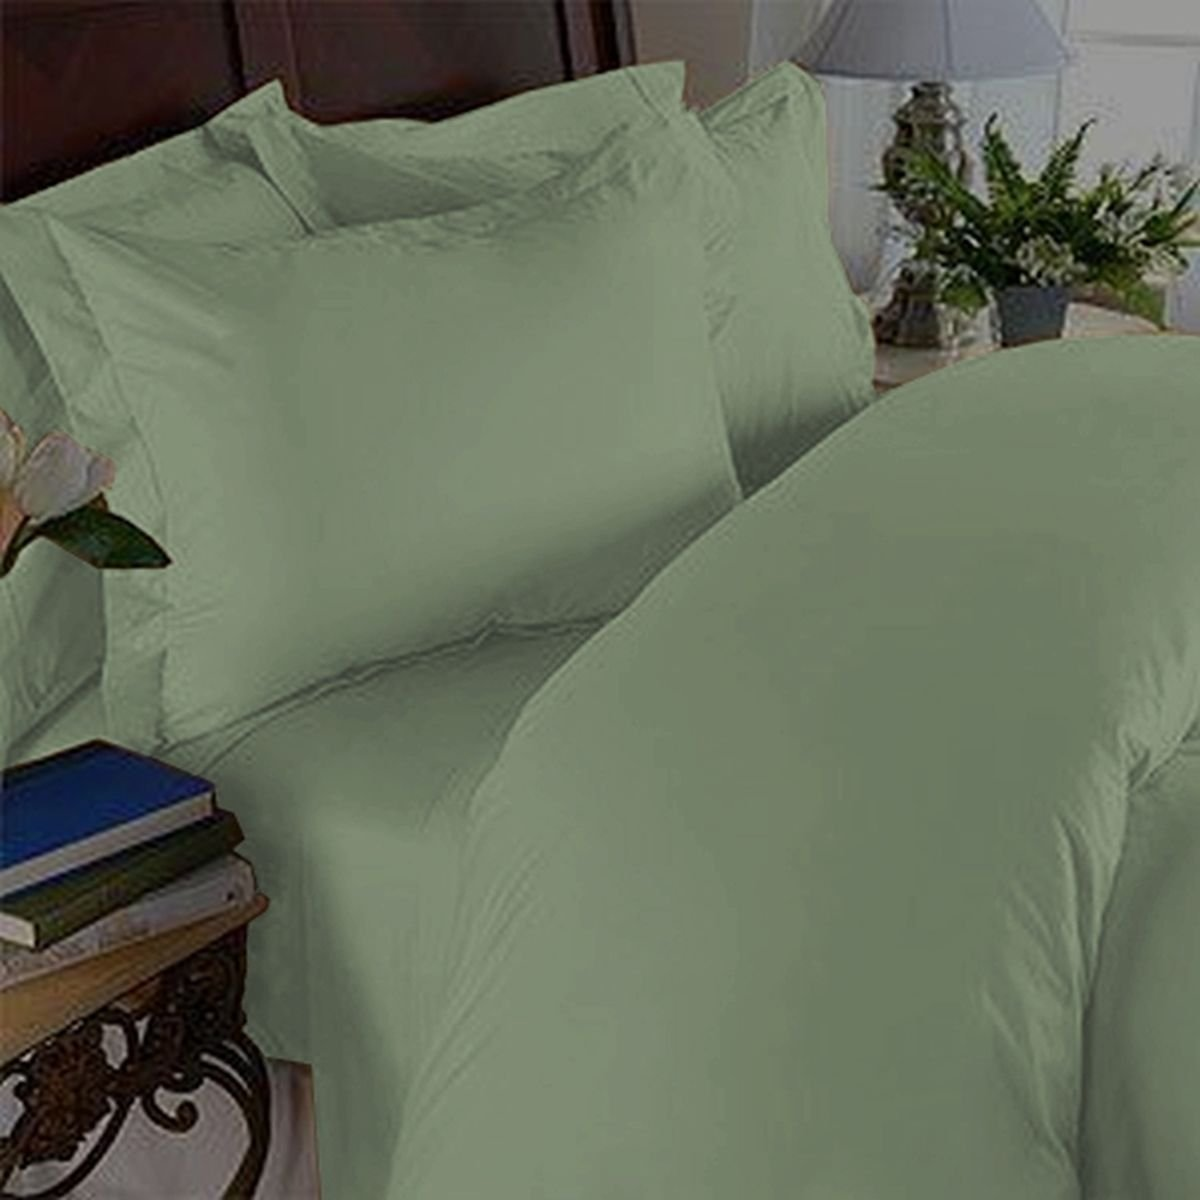 Elegant Comfort 4 Piece 1500 Thread Count Luxury Ultra Soft Egyptian Quality Coziest Sheet Set, California King, Sage